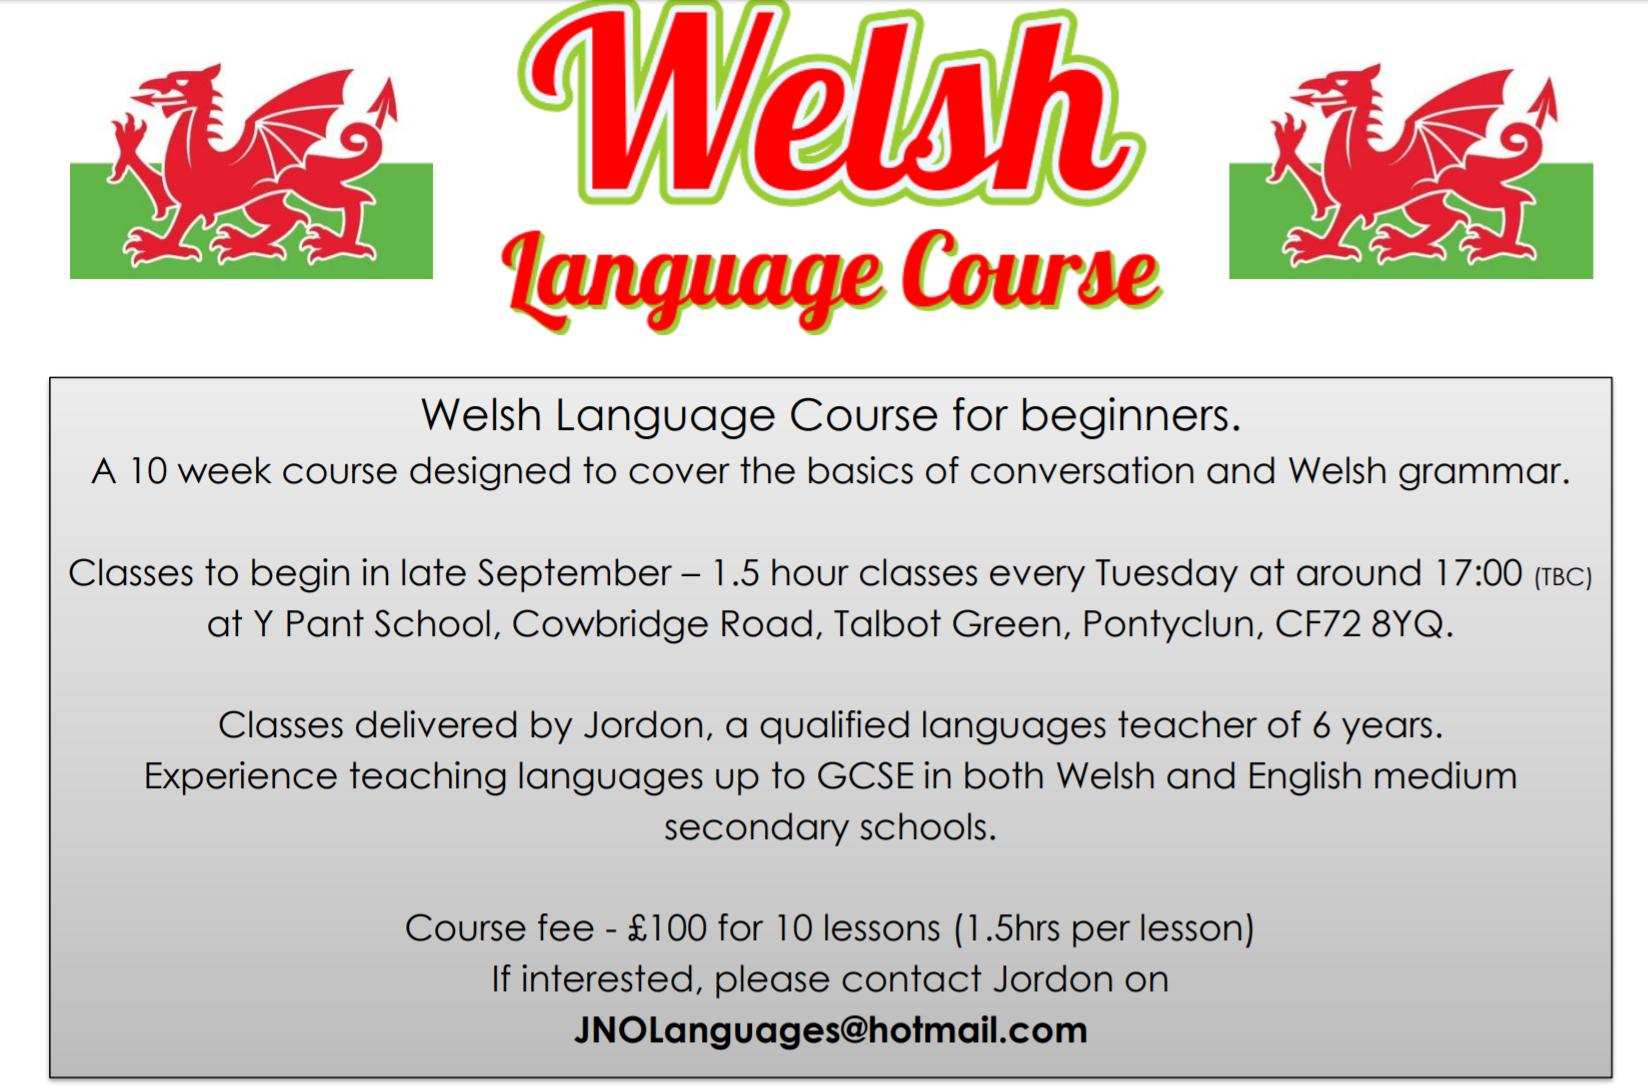 Welsh coursework help